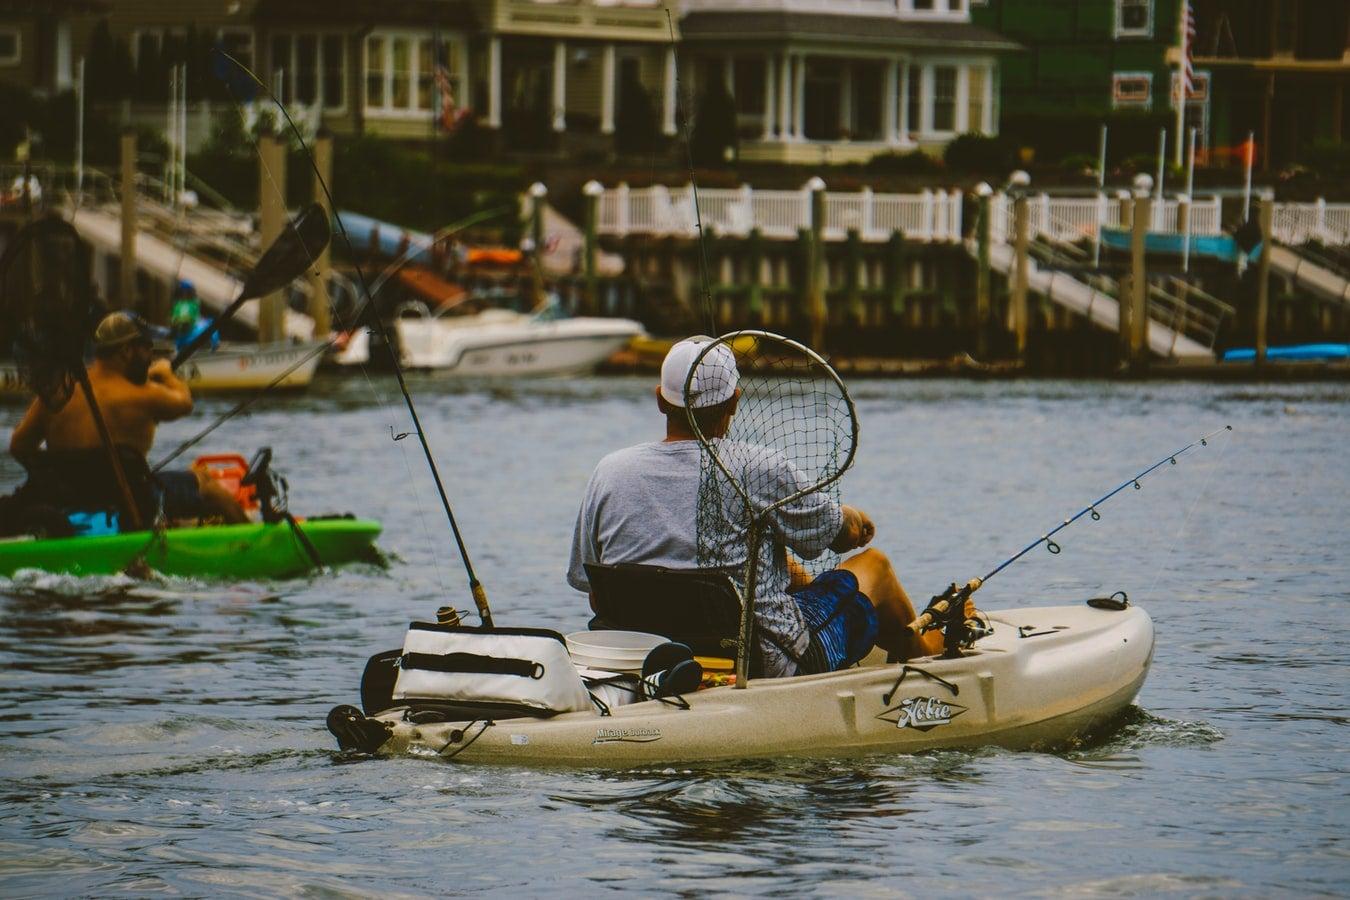 Two kayak anglers make their way down a river.